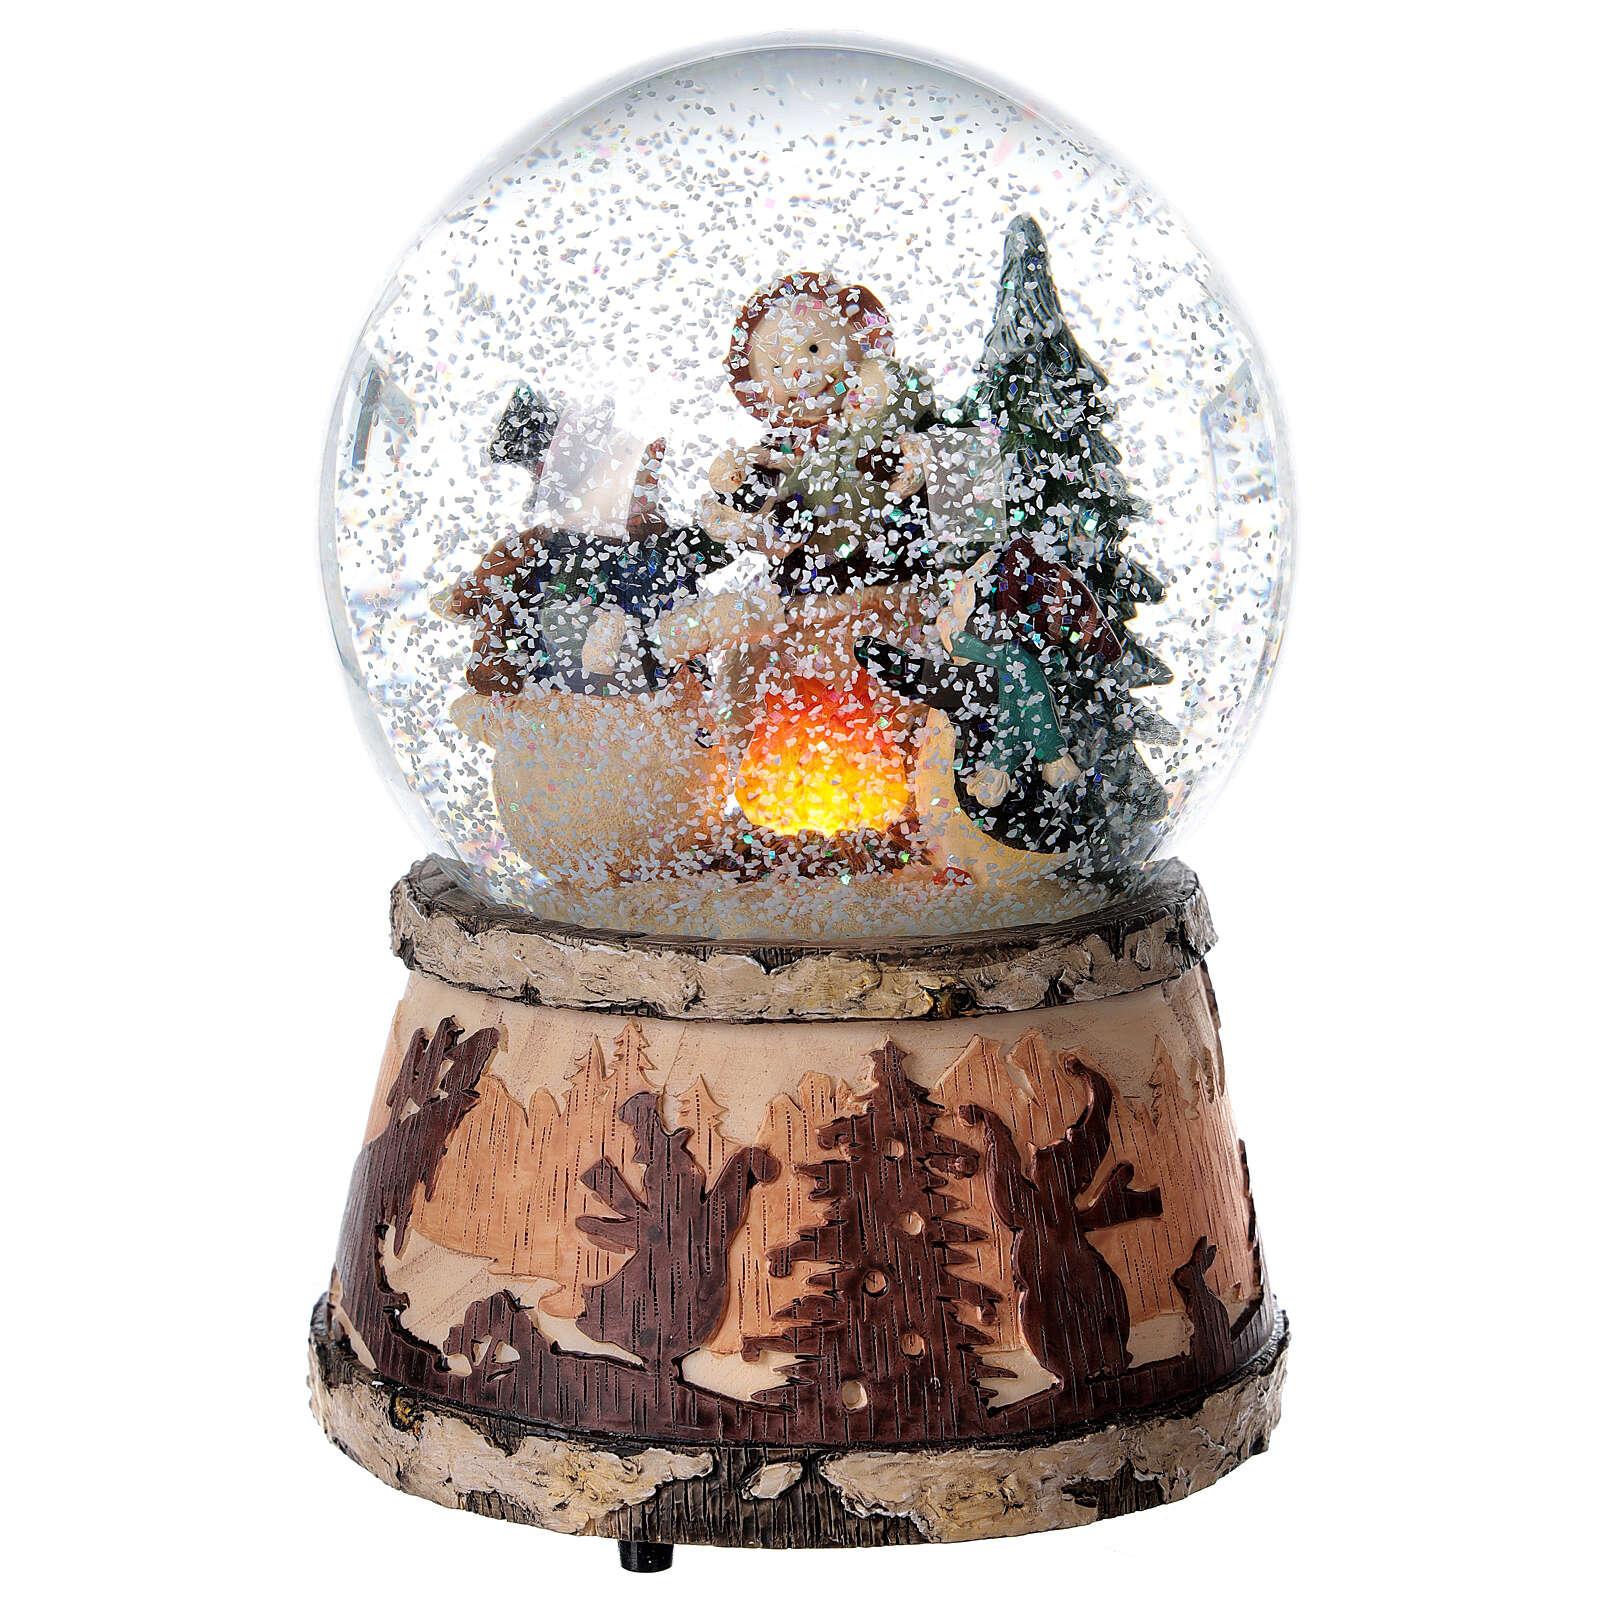 Glitter snow globe snowman fire music 15x10x10 cm 3